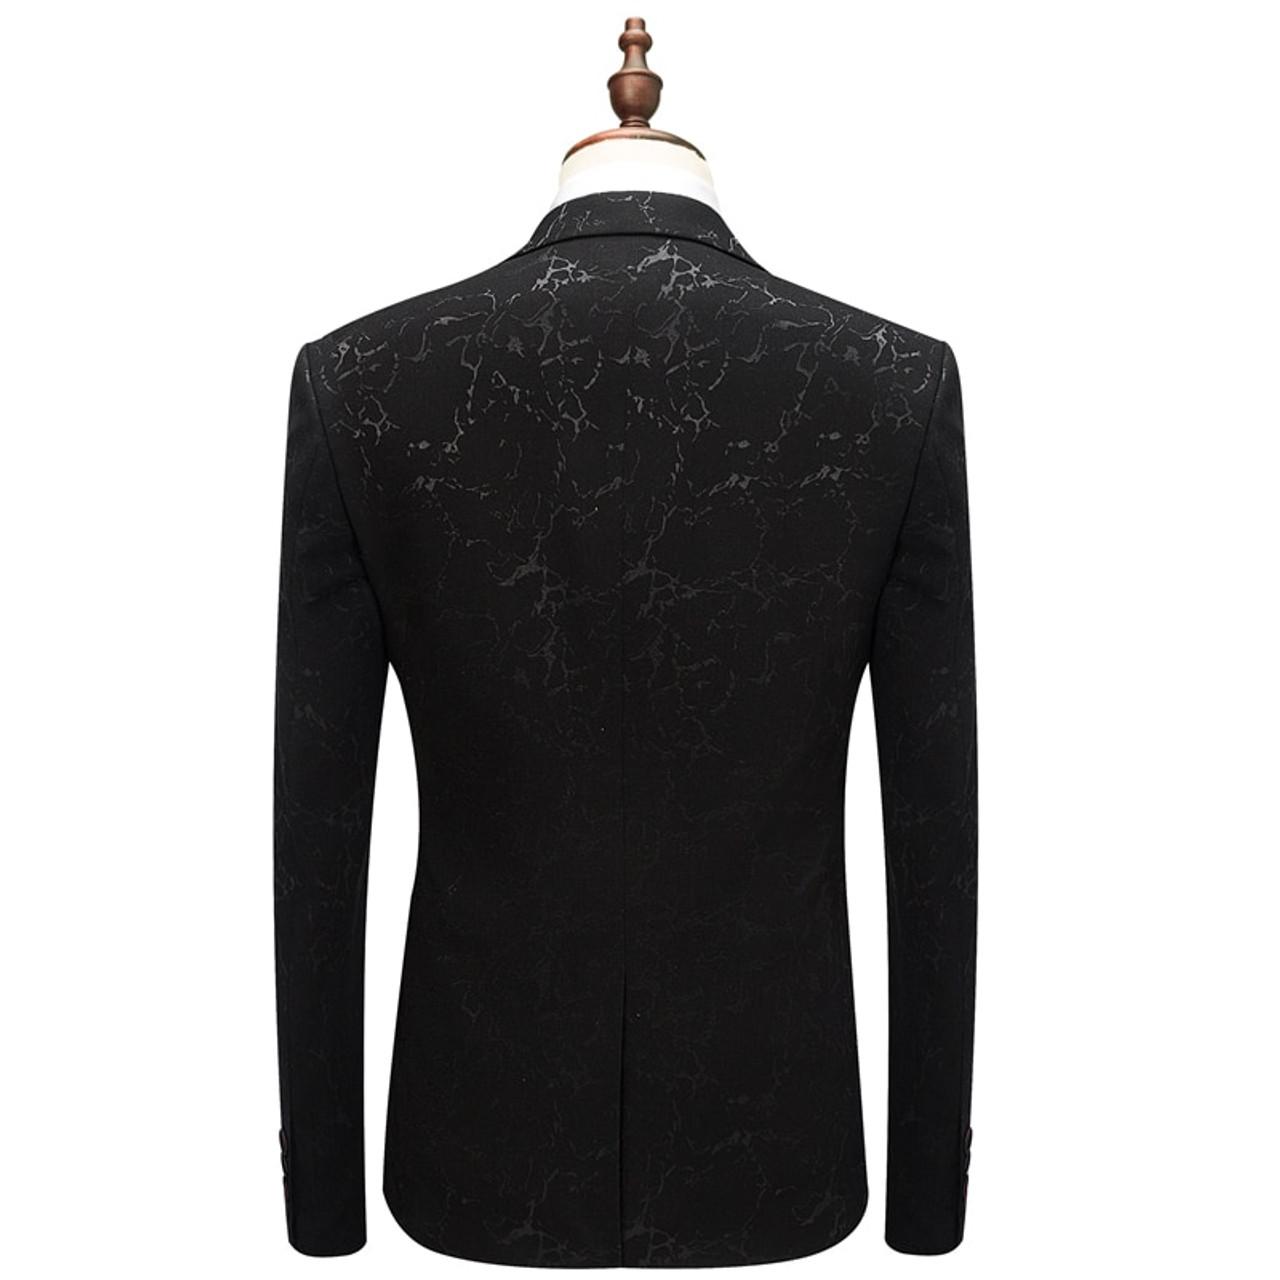 976bba1d5e6 ... Plyesxale Wedding Tuxedo Suits For Men 3 Piece Slim Fit Mens Printed  Suit Brand 5XL 6XL ...